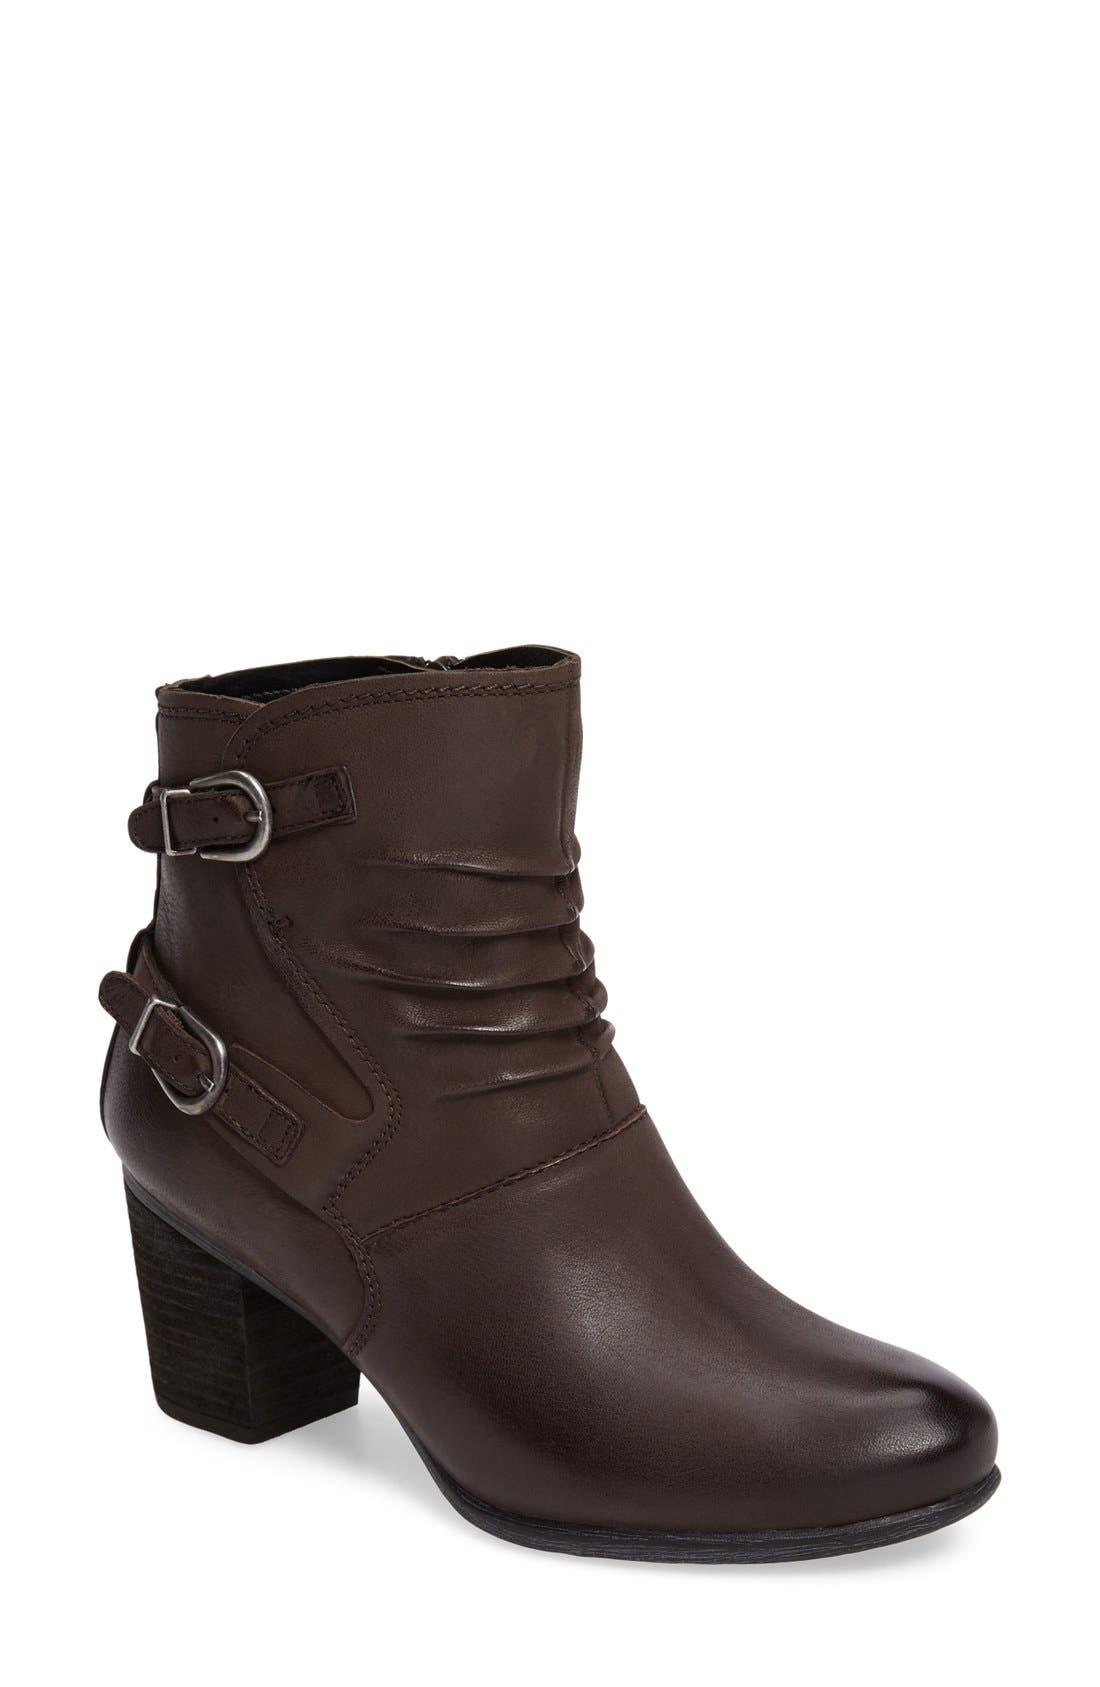 Main Image - Josef Seibel 'Britney 37' Boot (Women)